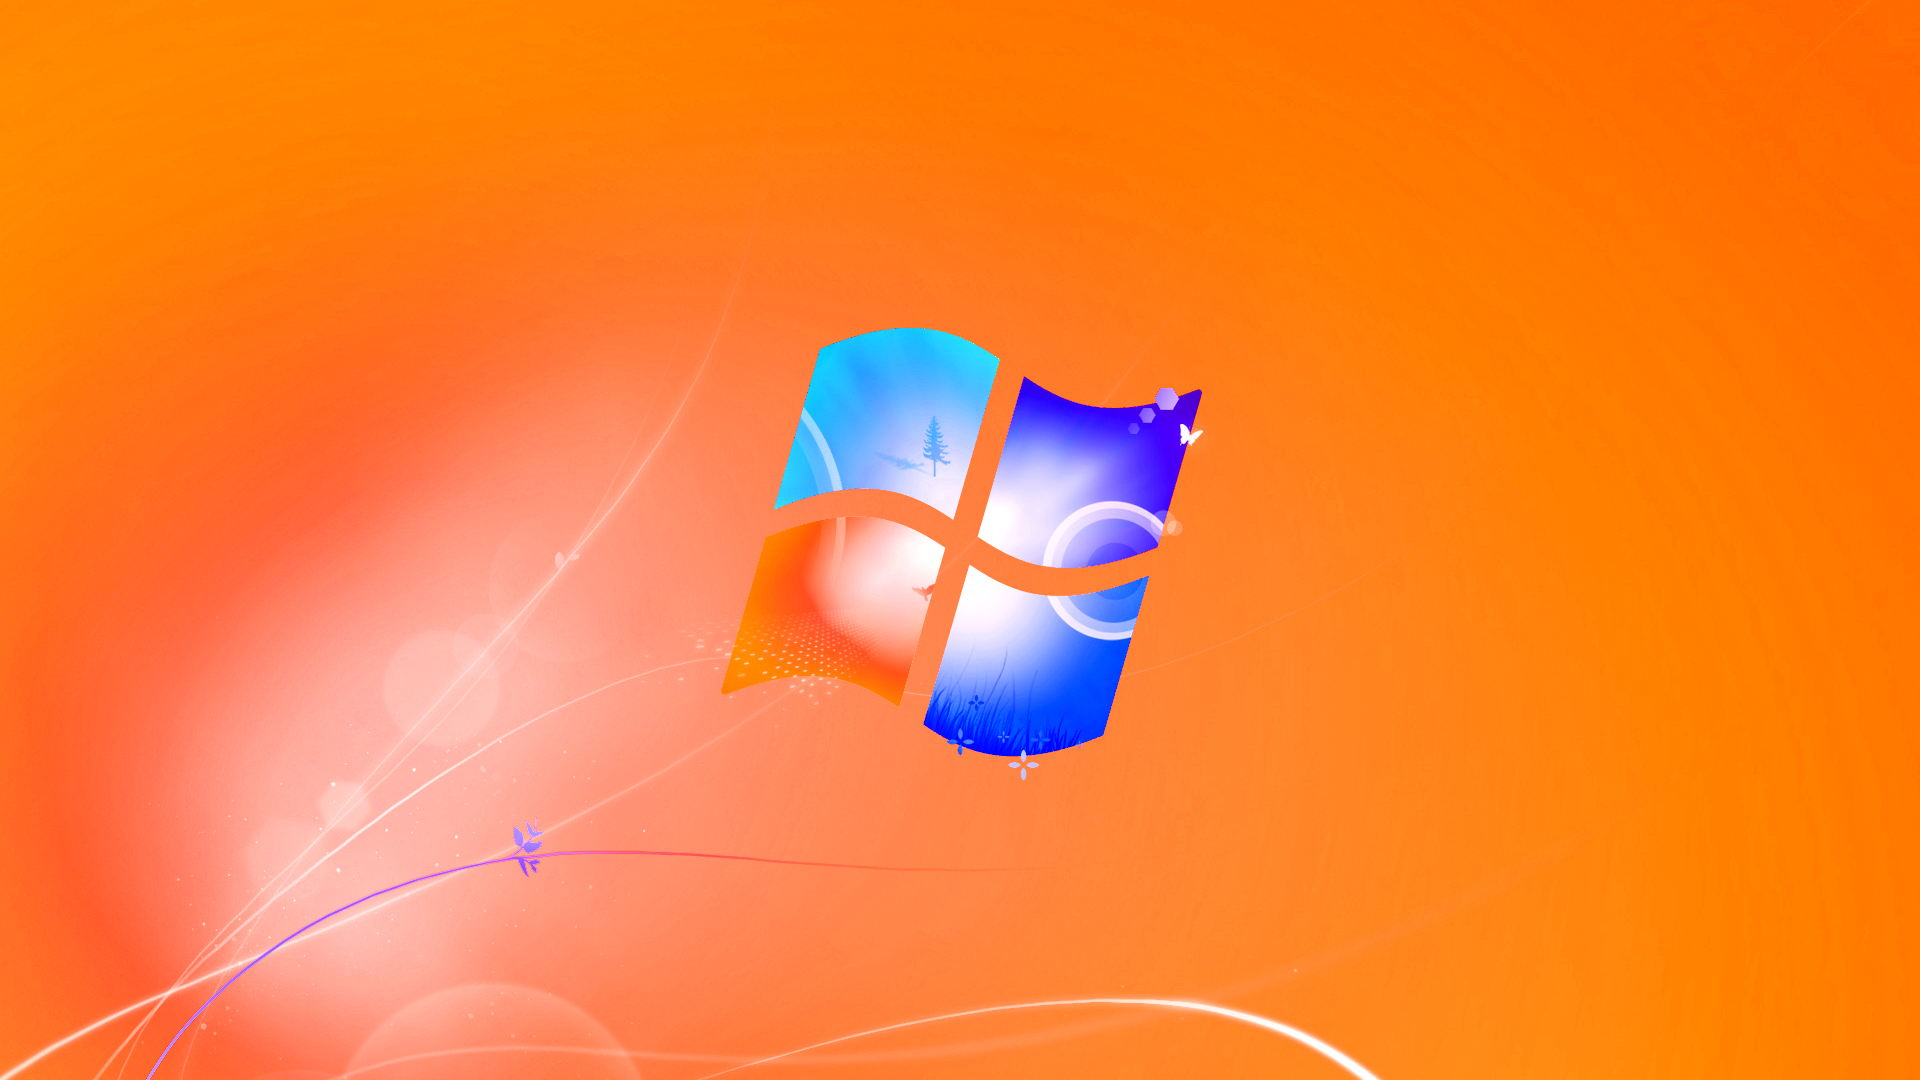 Download orange windows logo wallpaper HD wallpaper 1920x1080